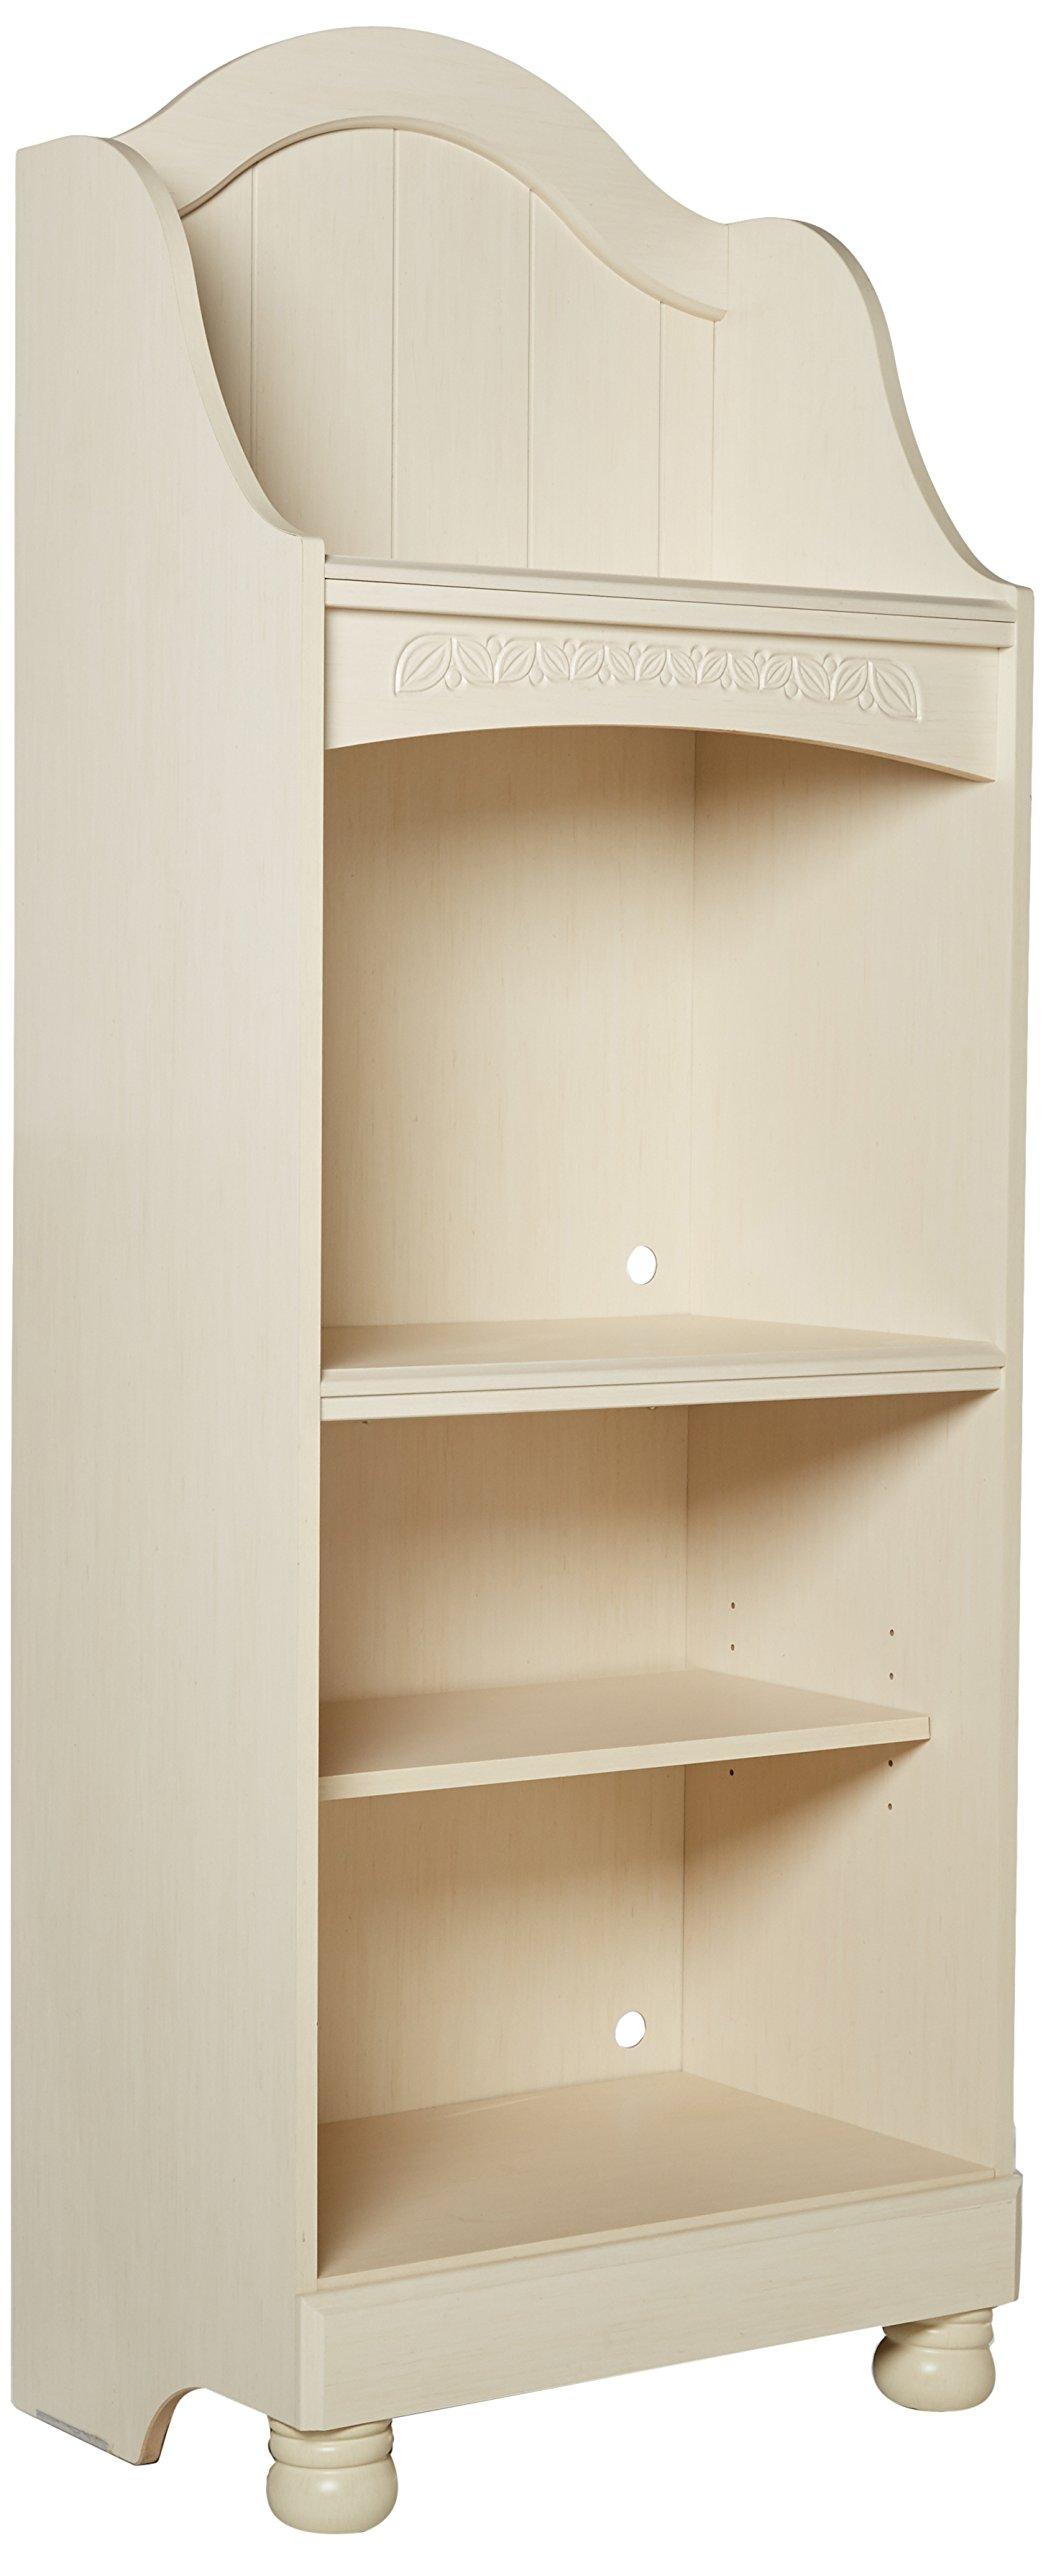 Ashley Furniture Signature Design - Cottage Retreat Bookcase - 4 Shelves 1 Adjustable - Casual Kids Room - Cream